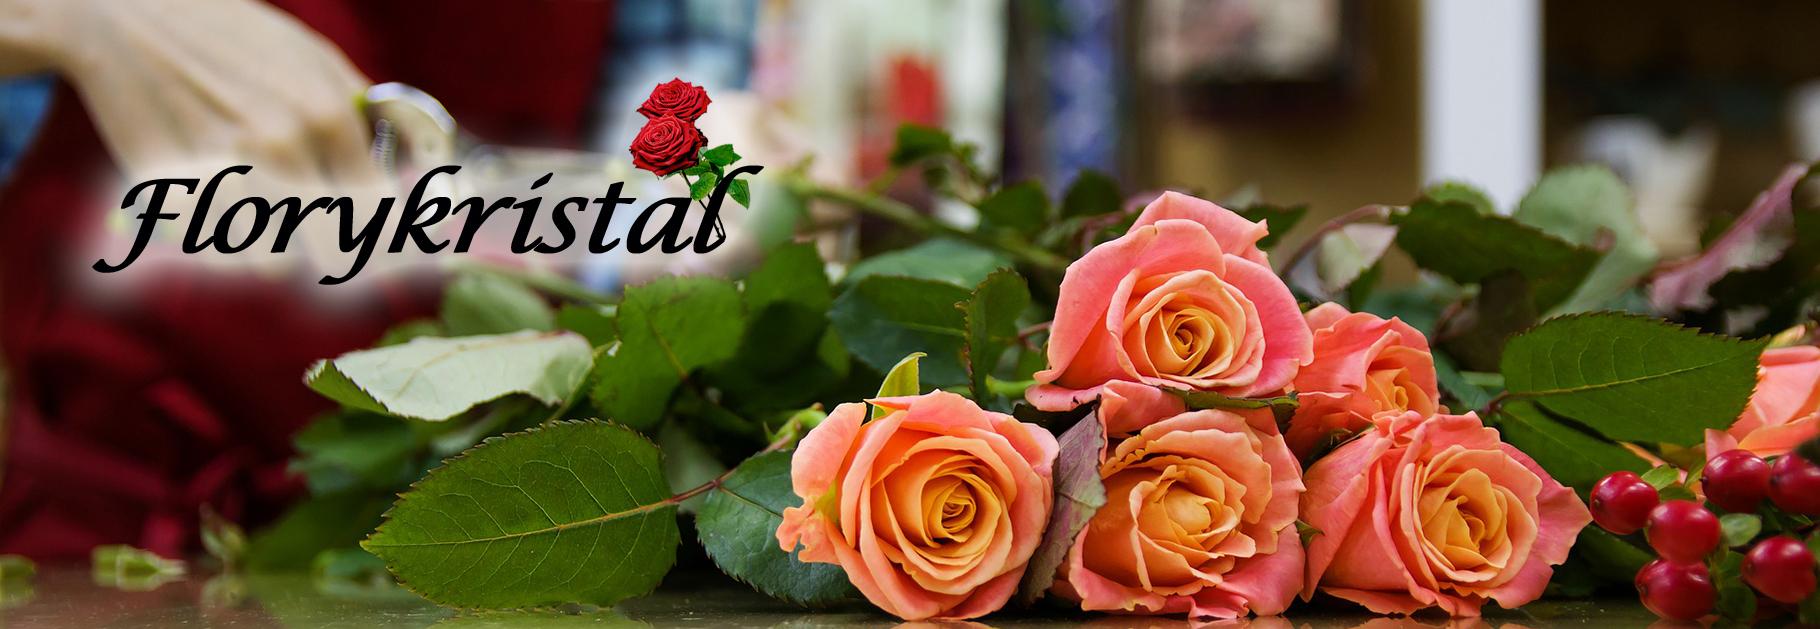 Florykristal Floristería En Guatemala